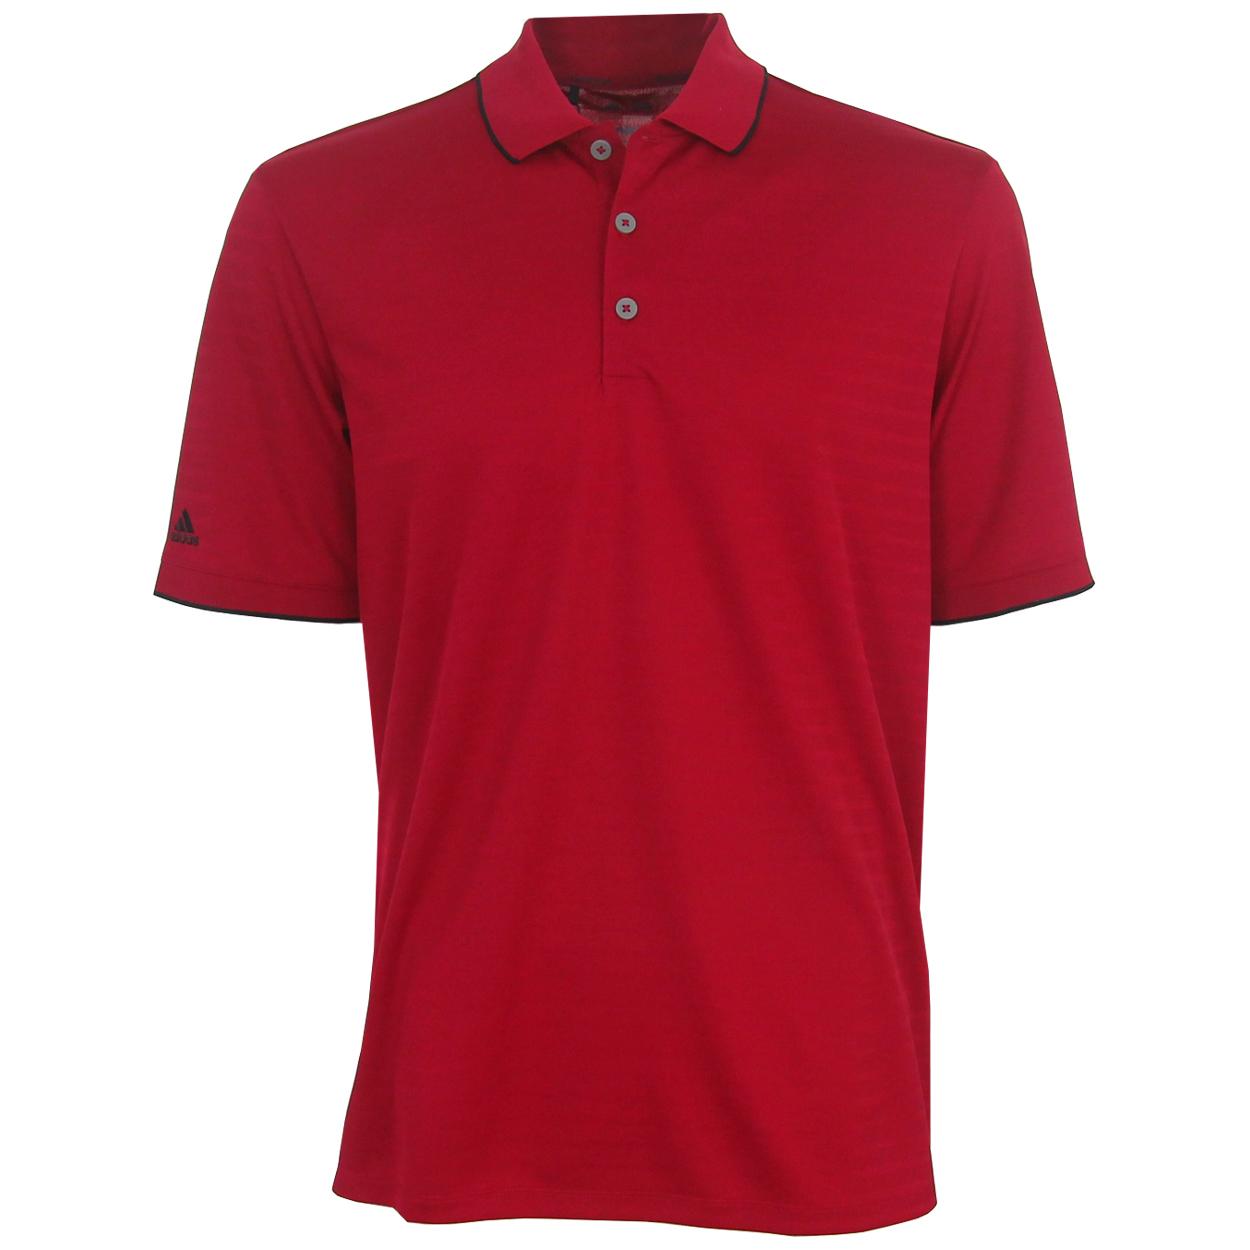 Adidas Golf Men 39 S Climacool Tipped Club Polo Shirt Brand New